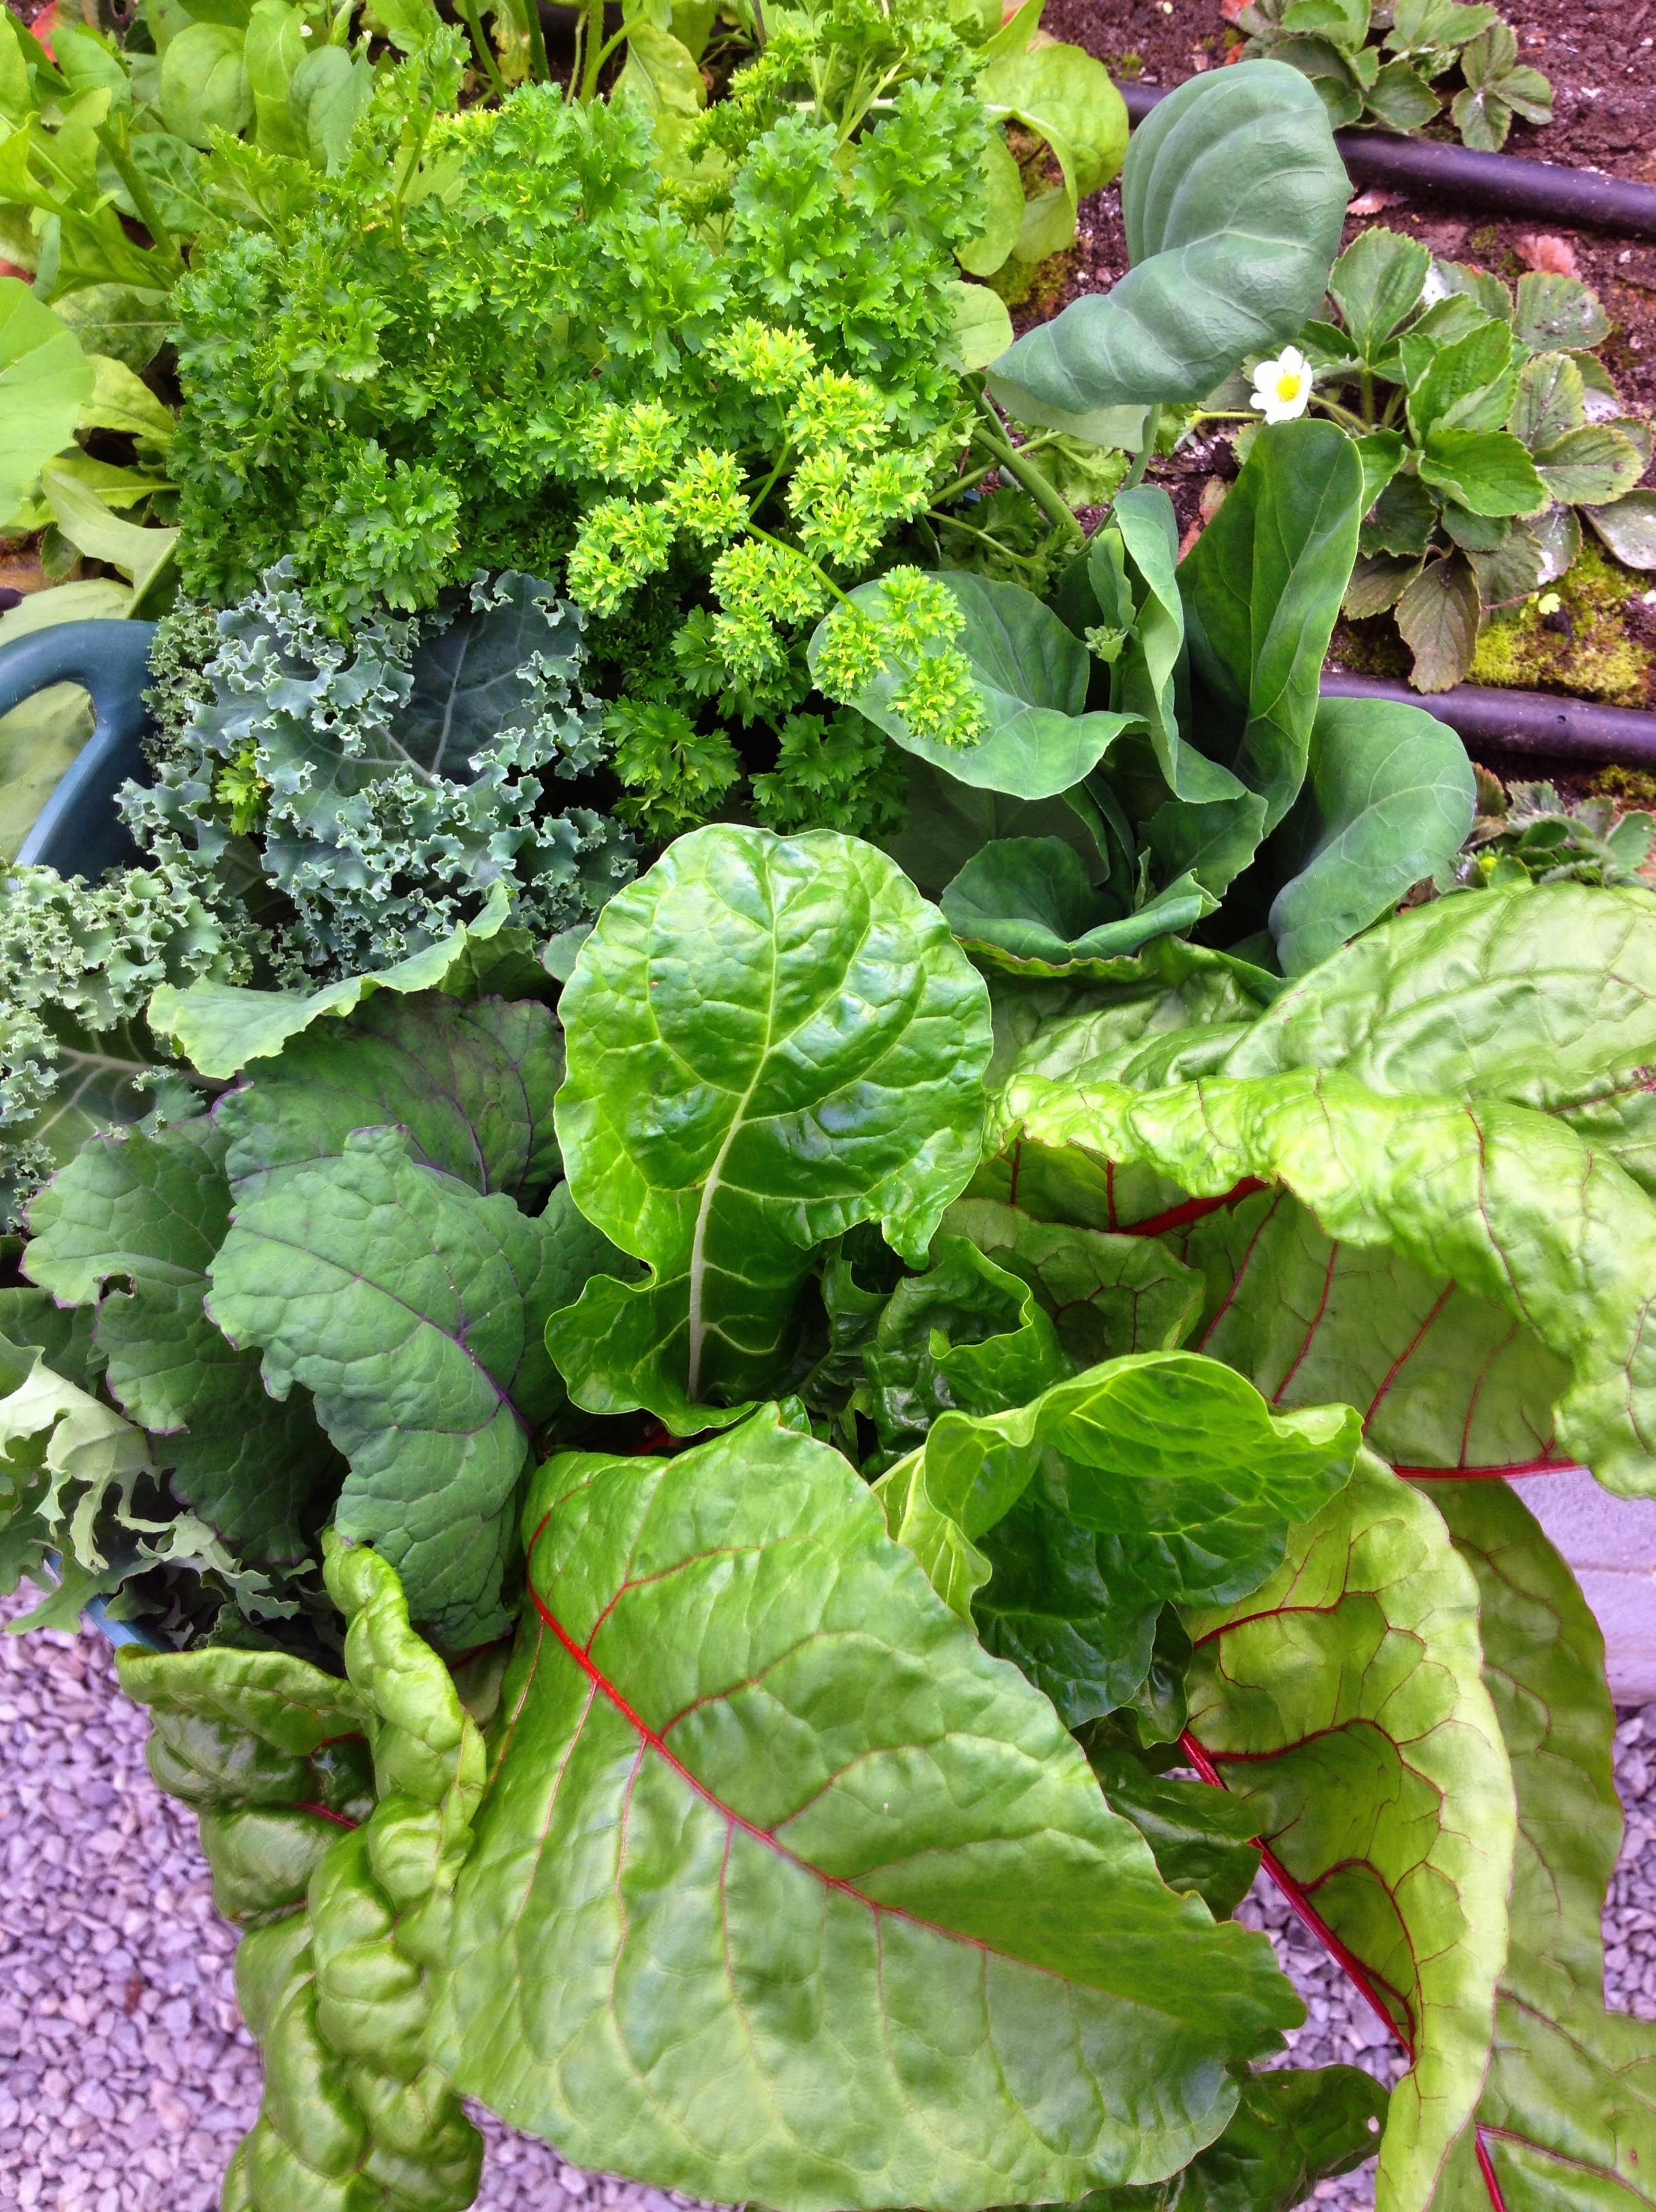 Food garden pictures - Img_8362